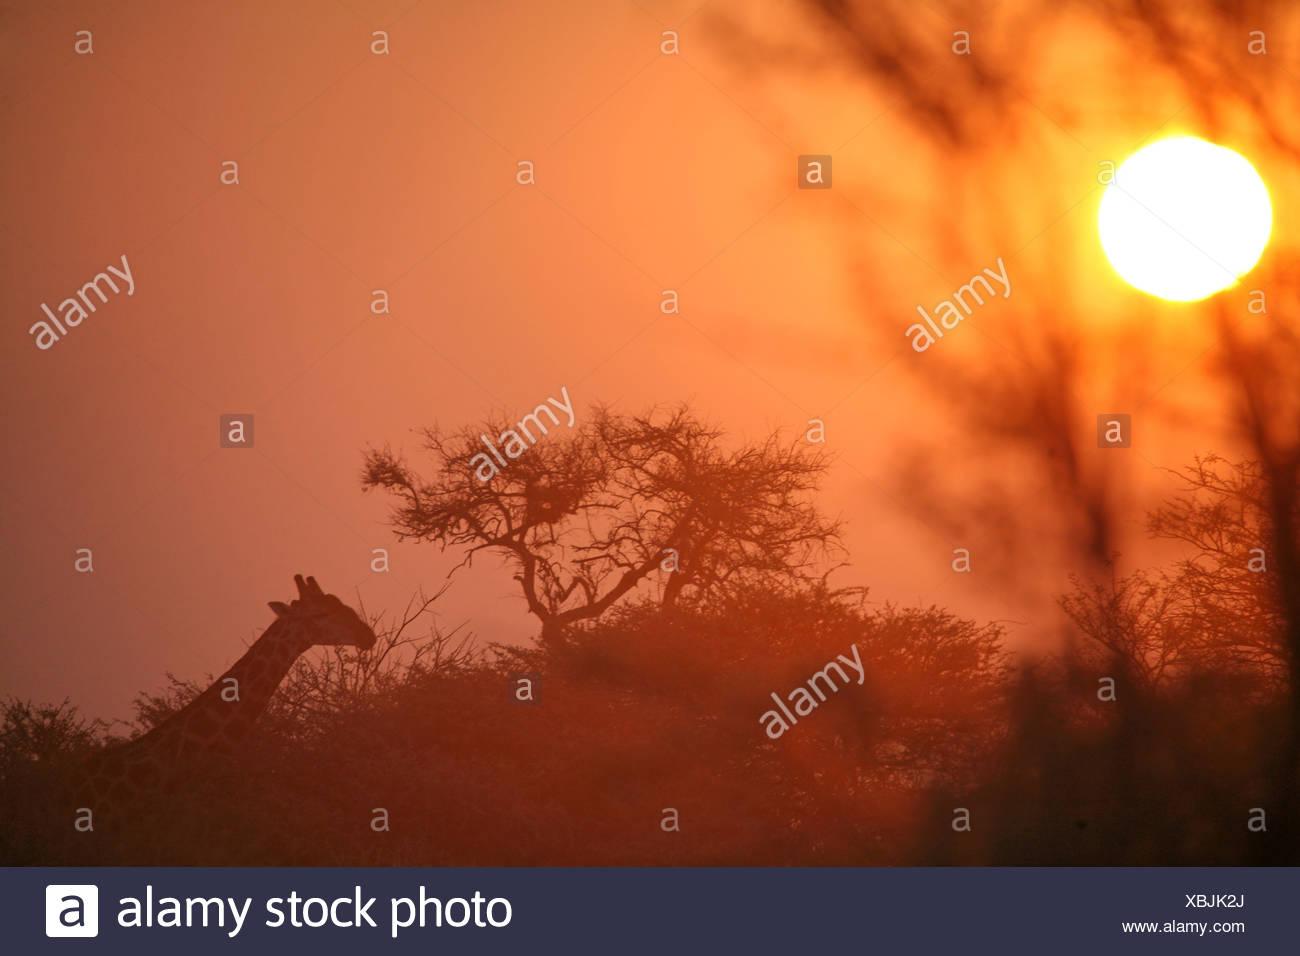 Namibia Africa Giraffe Giraffa camelopardalis Etosha national park Summer 2007 Africa savannah sunset sunris - Stock Image